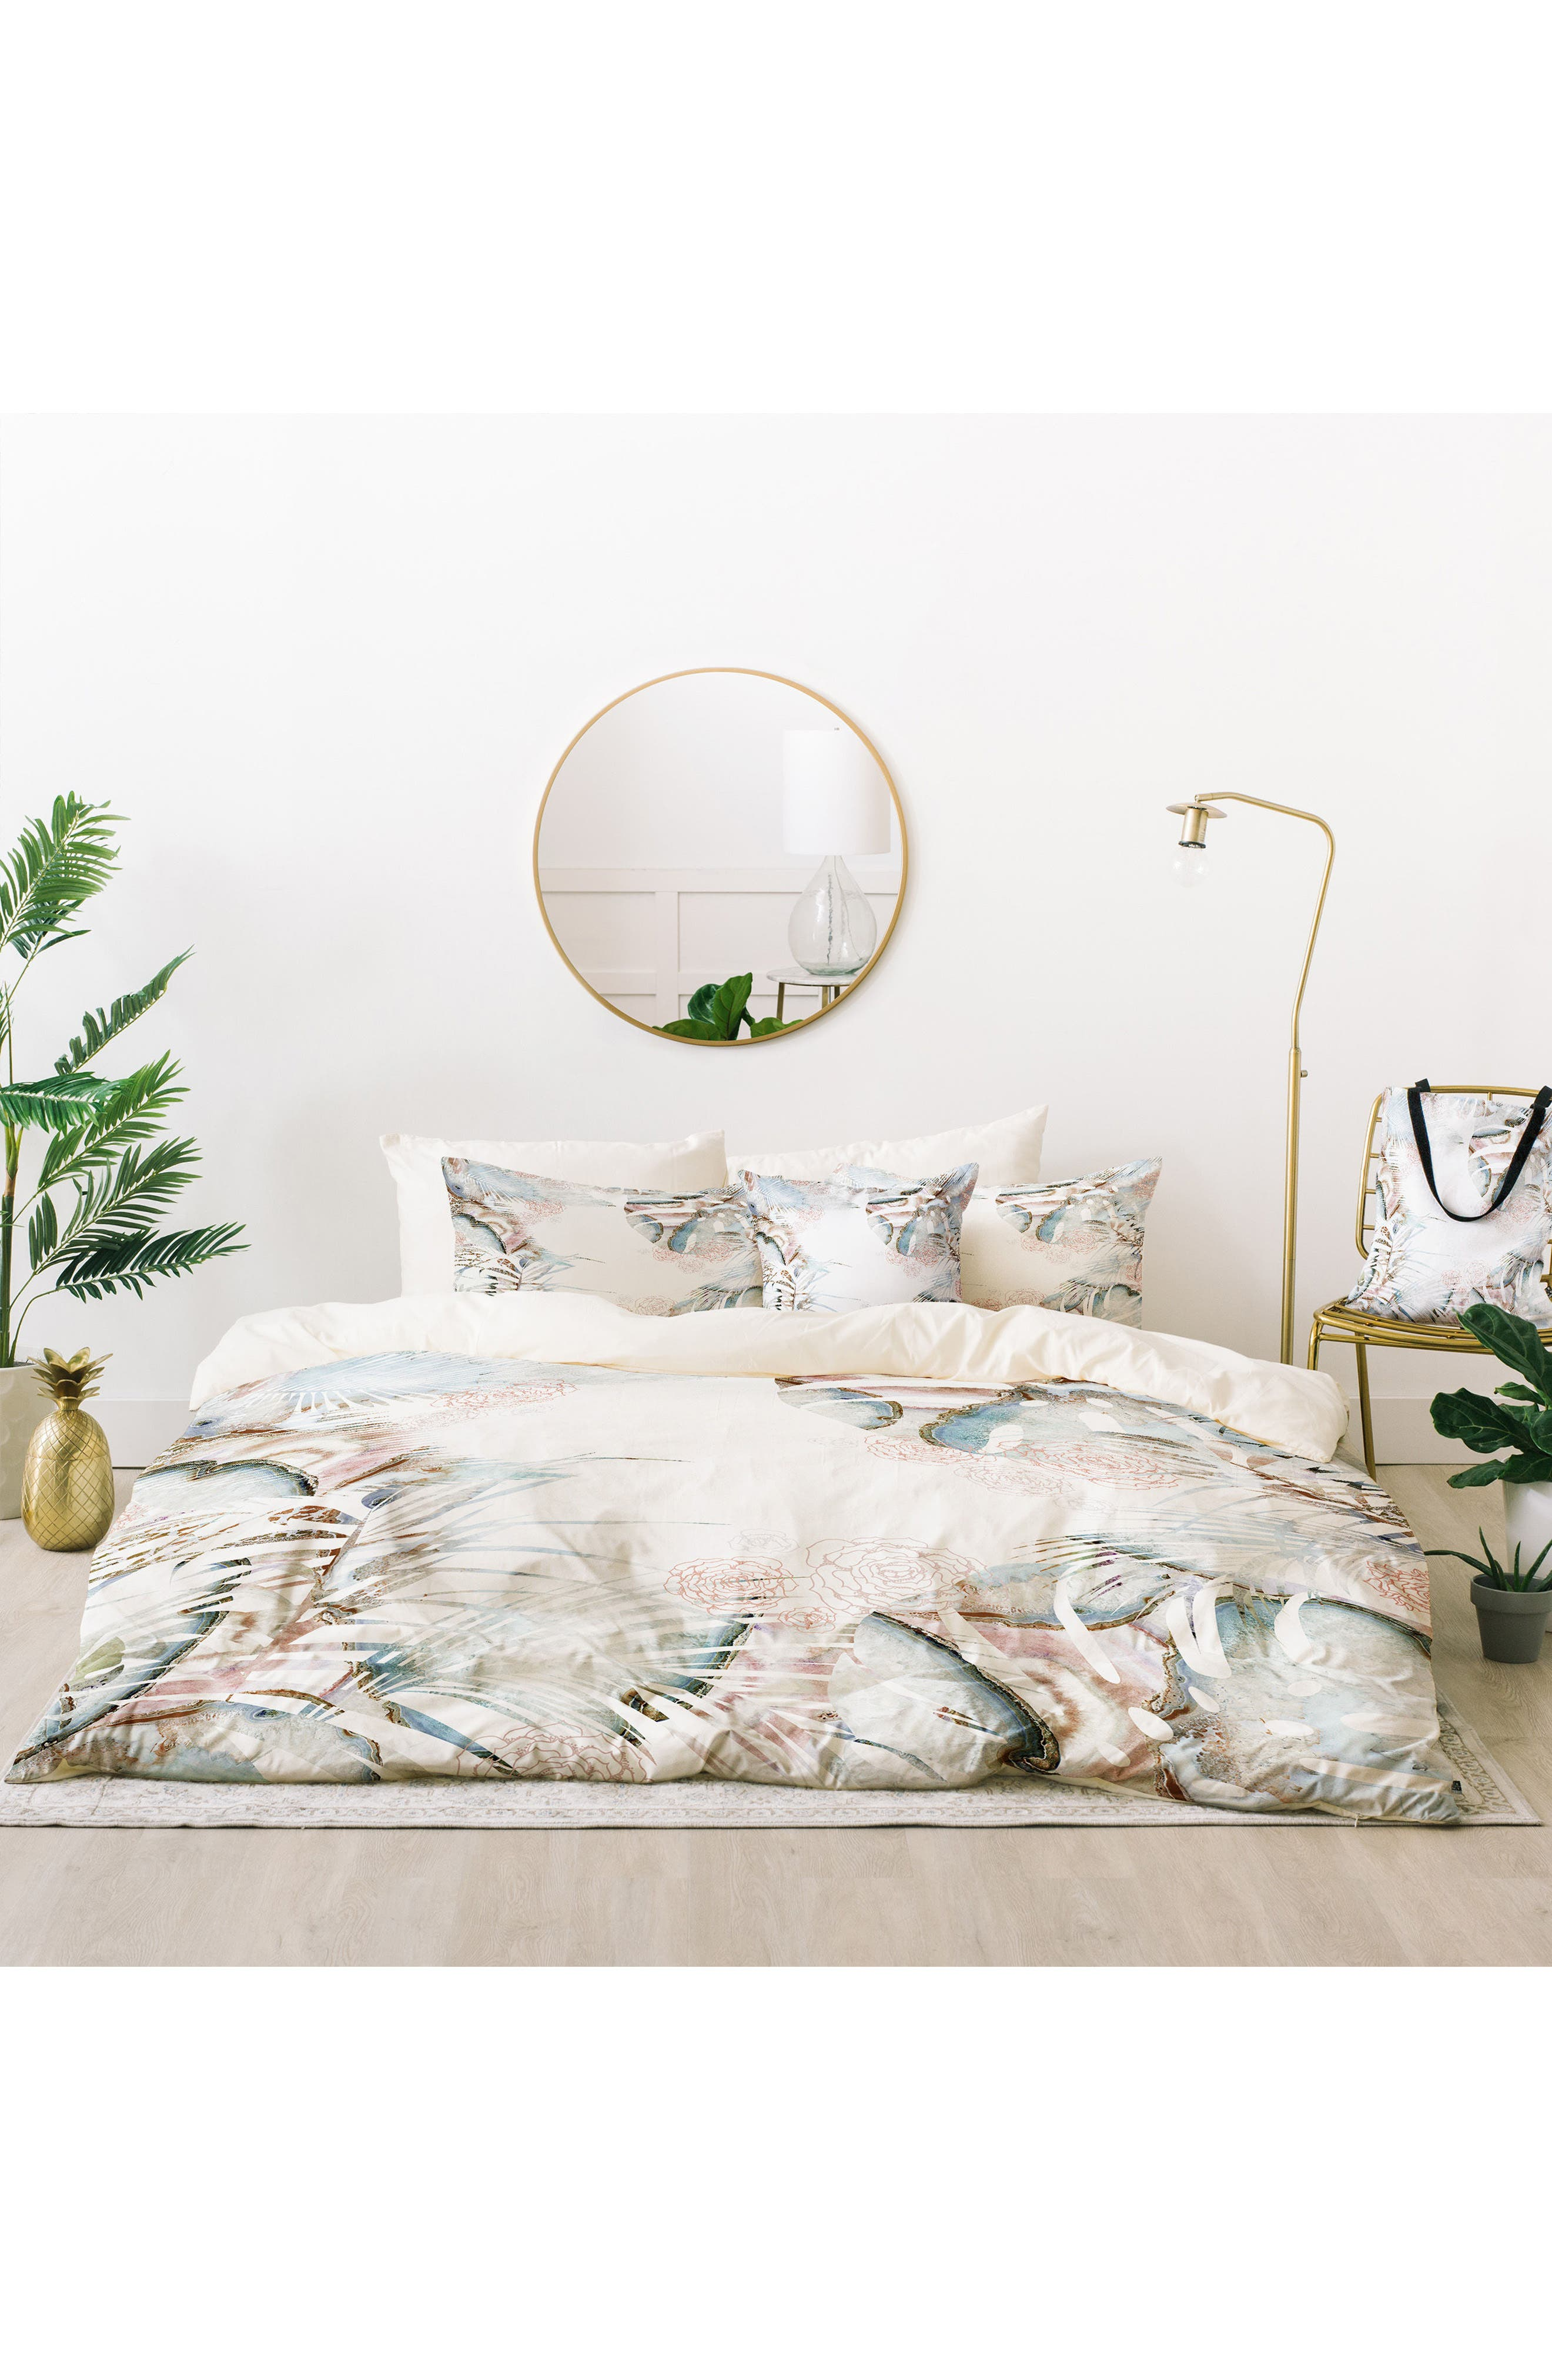 Iveta Abolina Honey It's Nap Time Bed in a Bag Duvet Cover, Sham & Accent Pillow Set,                         Main,                         color, 400